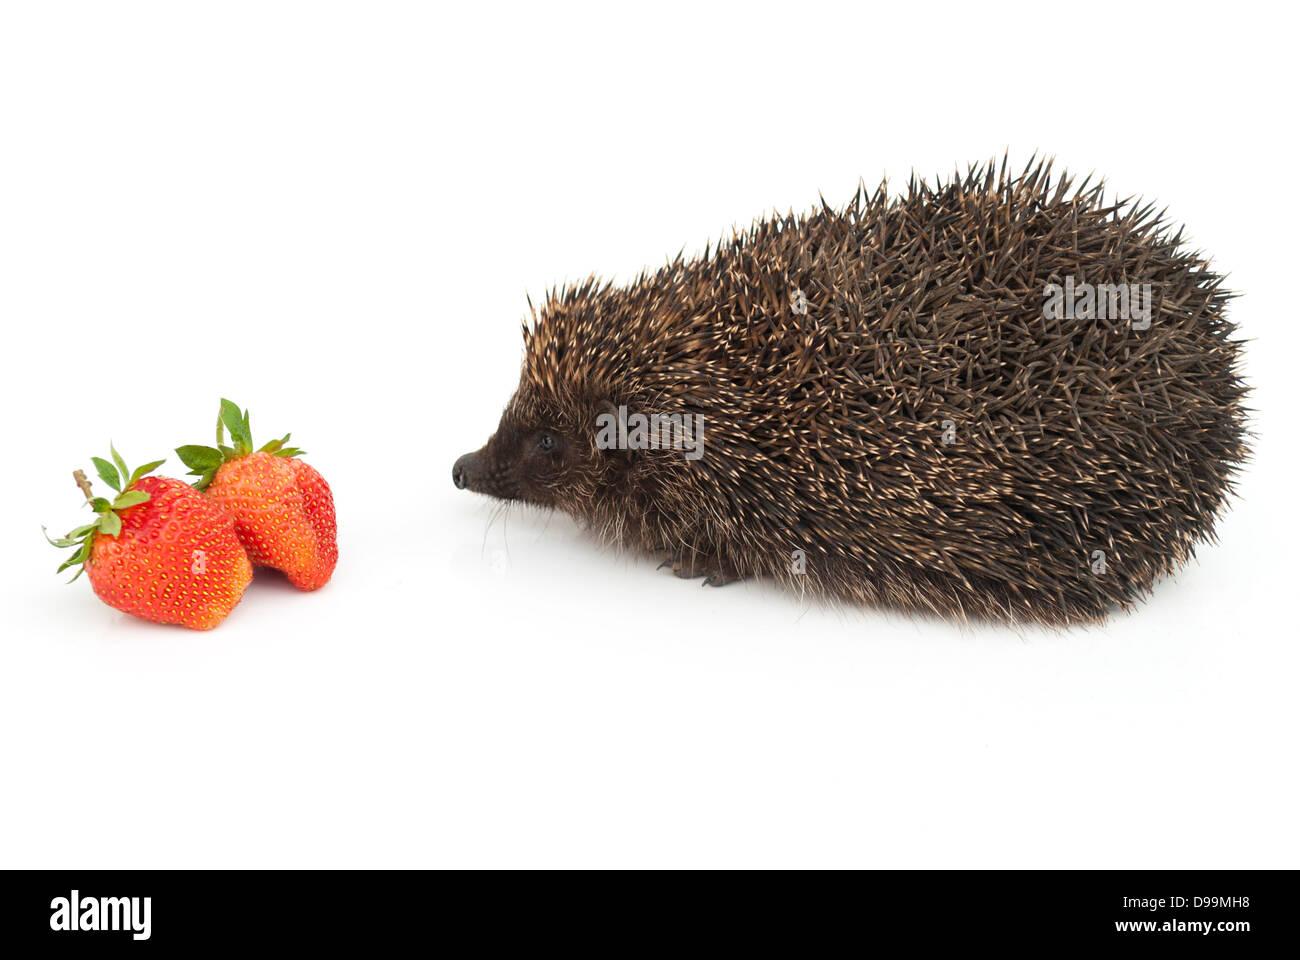 Hedgehog and strawberries Stock Photo